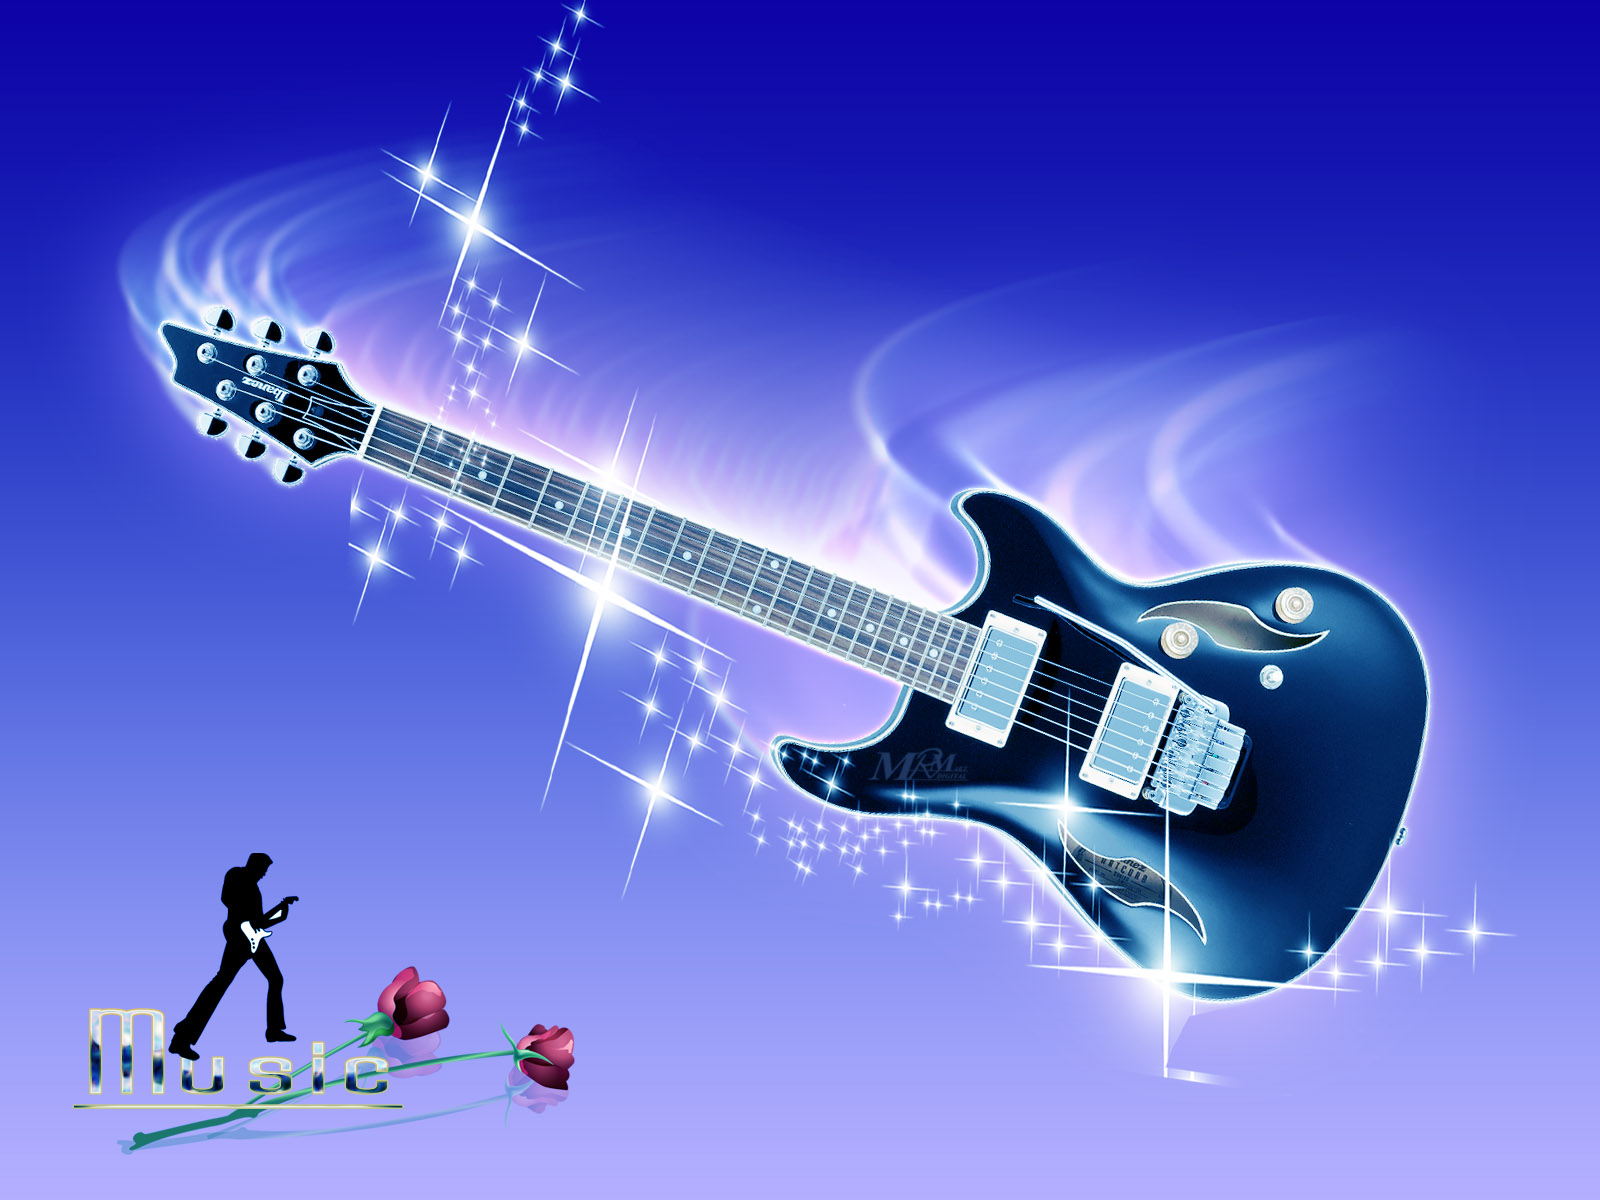 Top Wallpaper Music Desktop - music-wallpaper-download-12  Best Photo Reference_752793.jpg